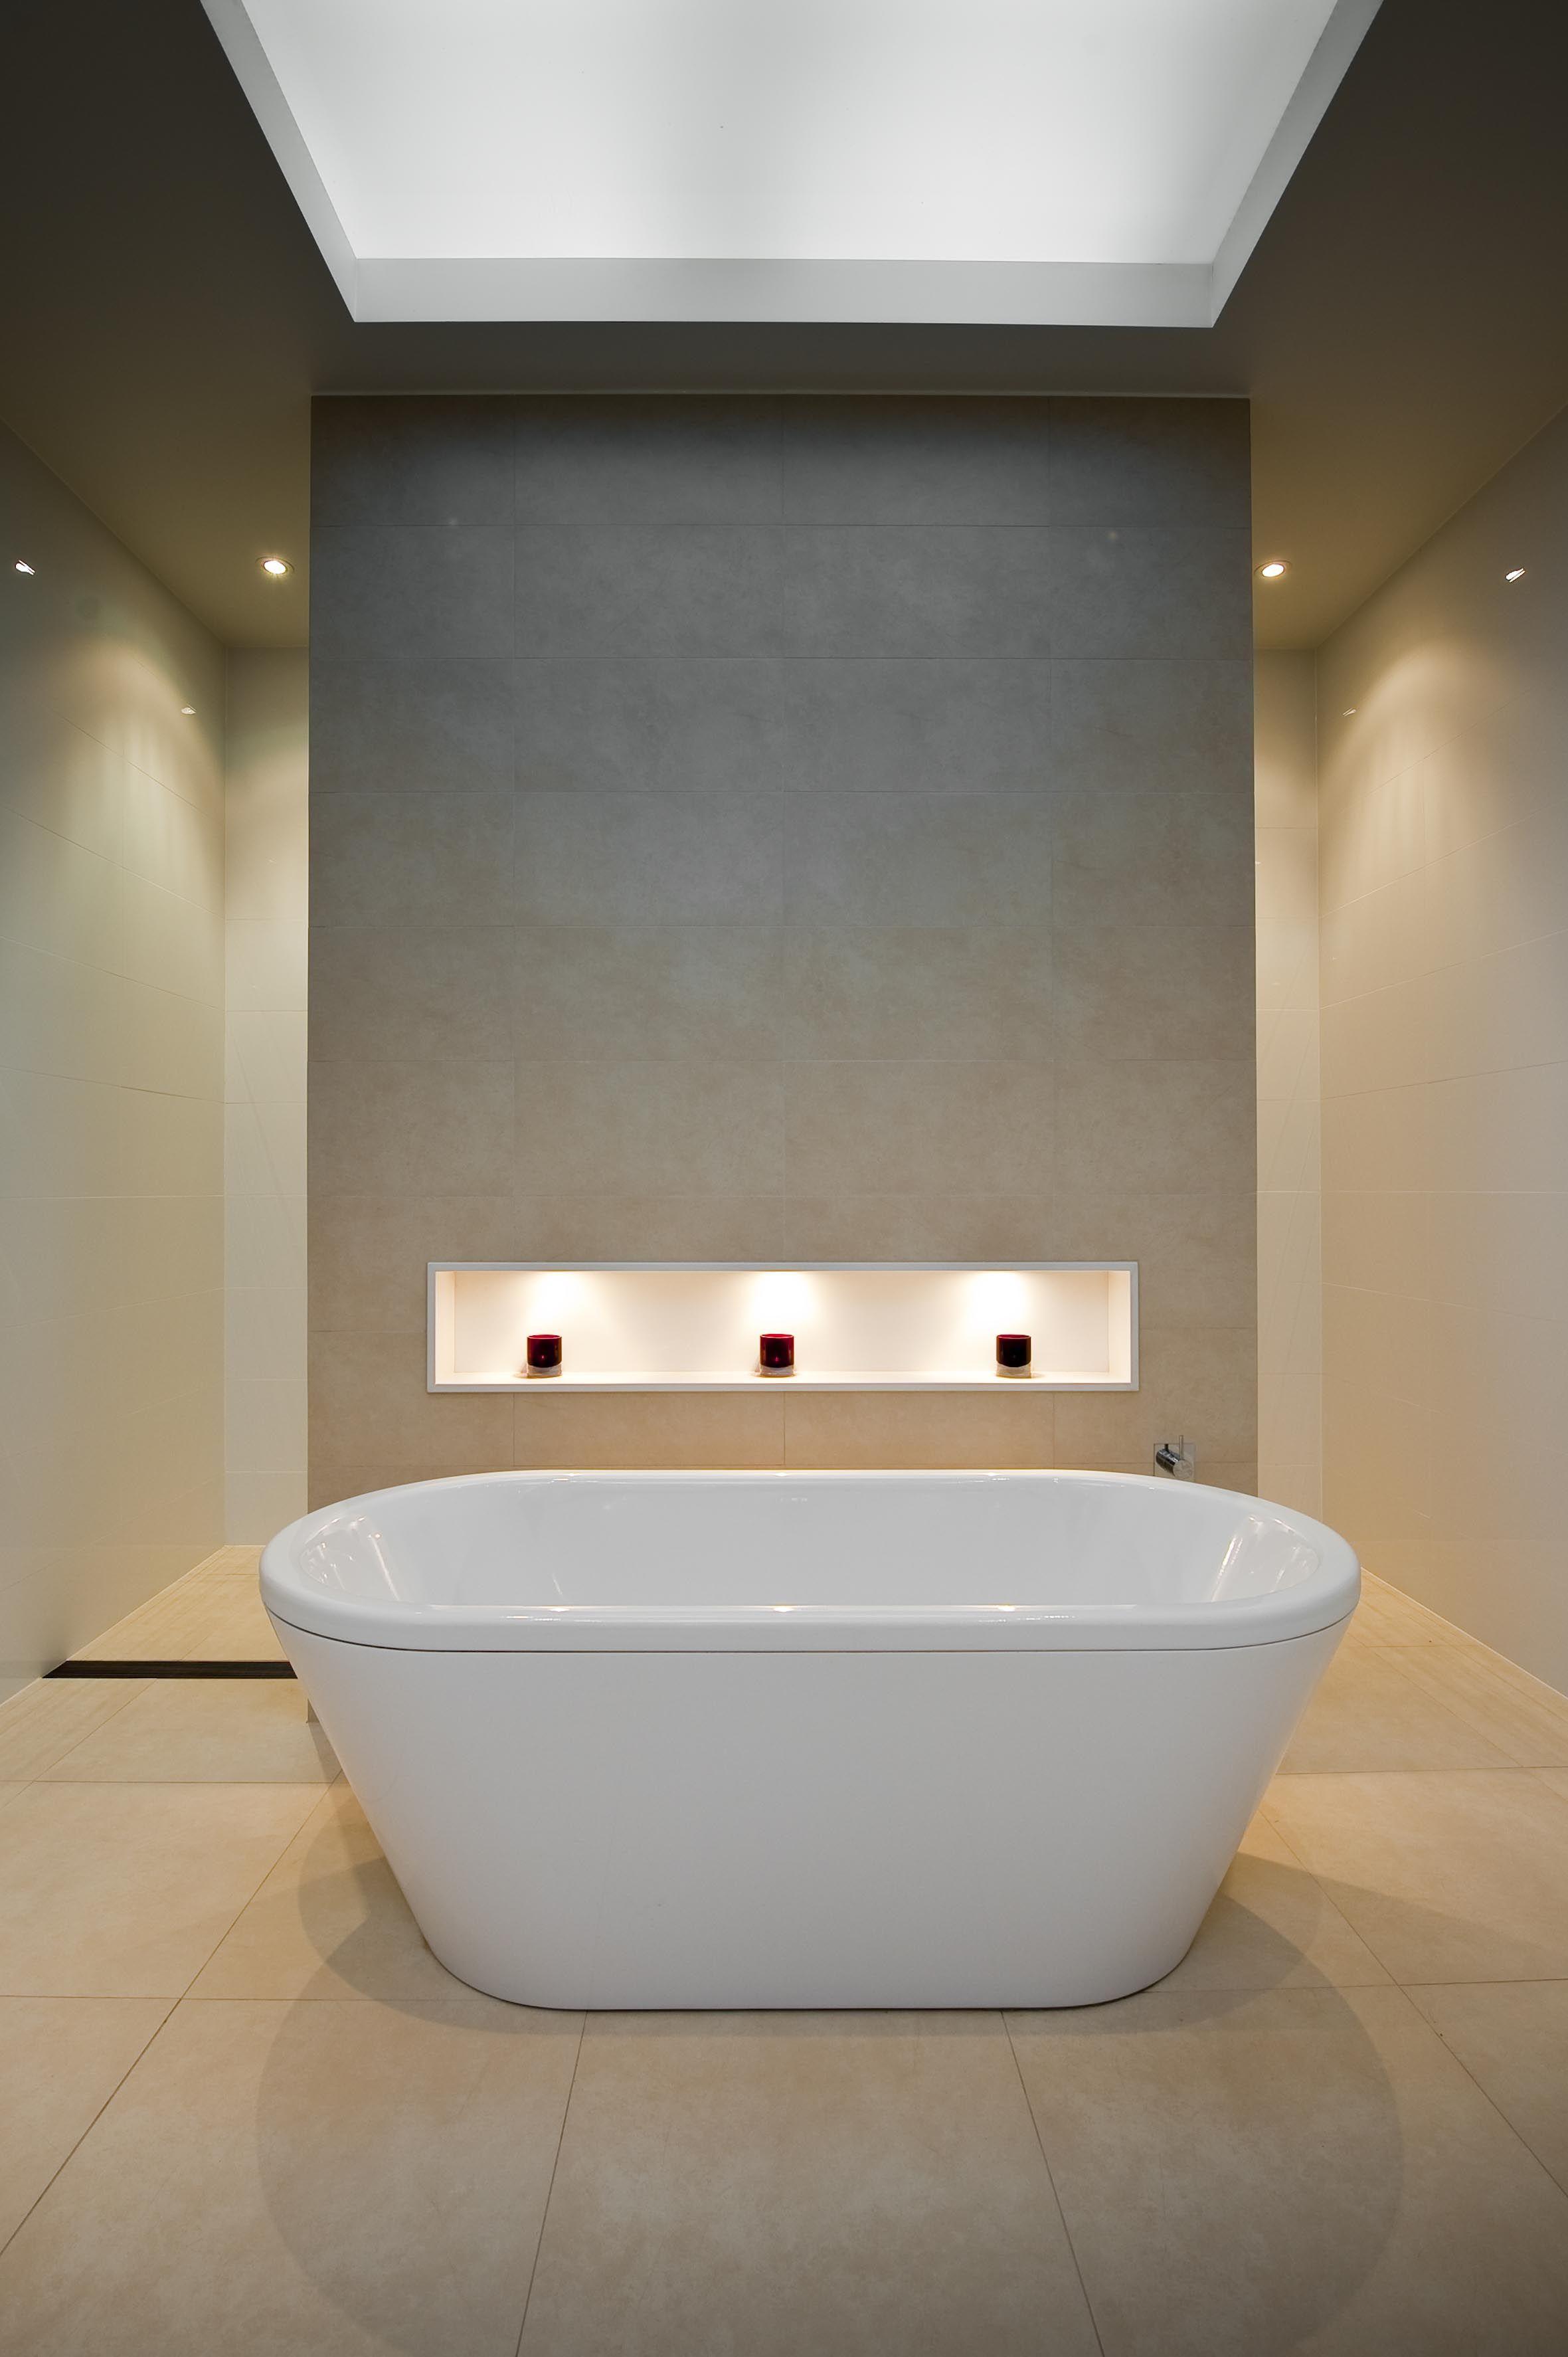 Free Standing Bath Feature Wall Niche Free Standing Bath Tub